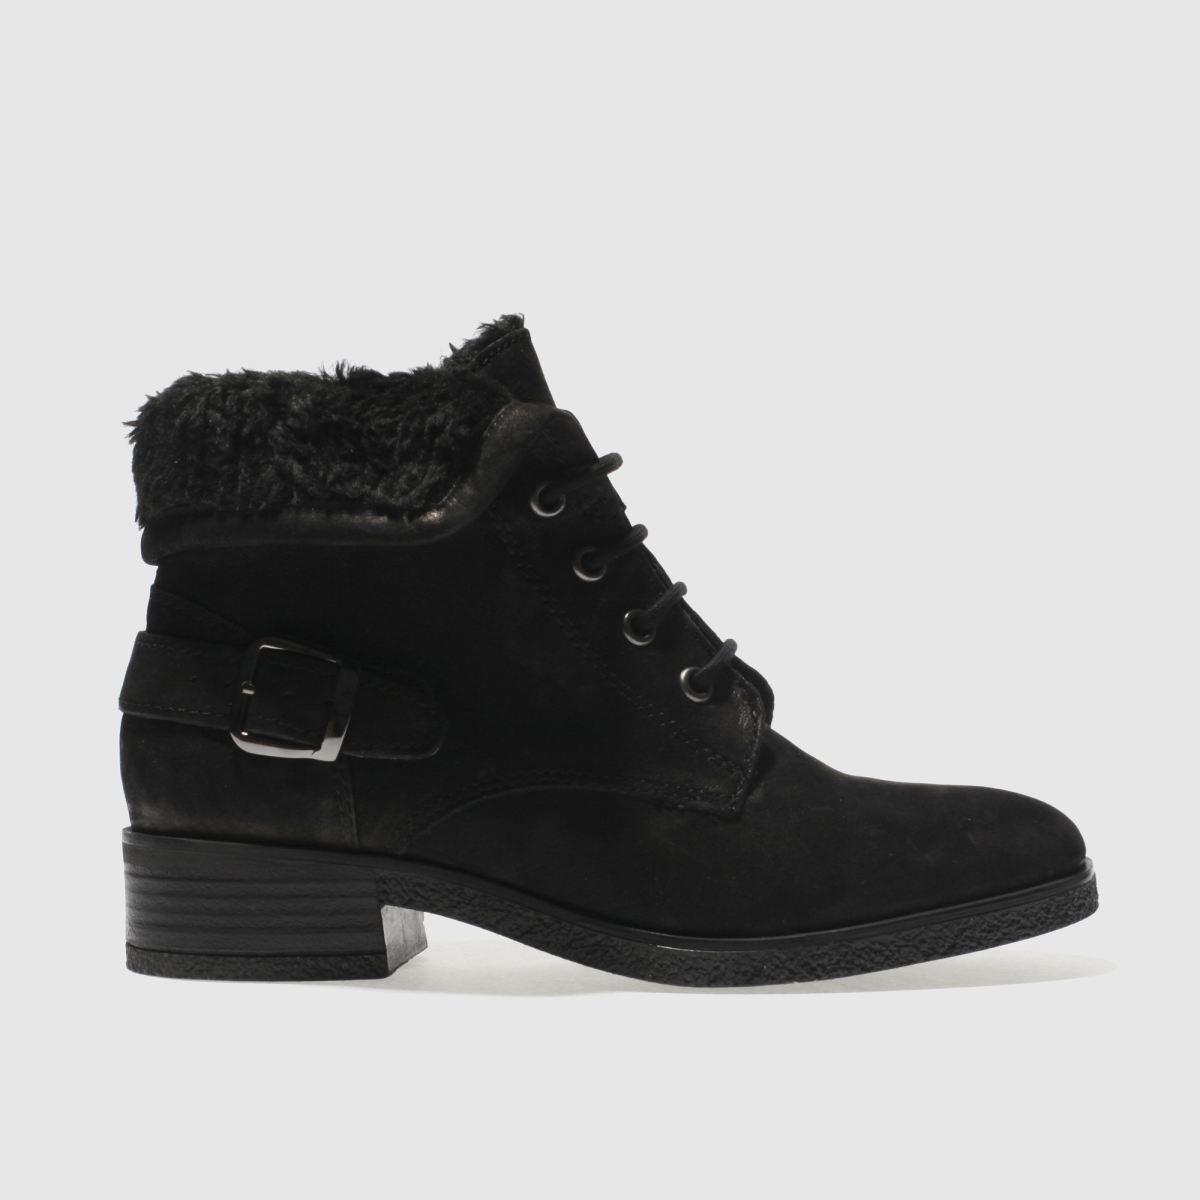 schuh black temptation boots